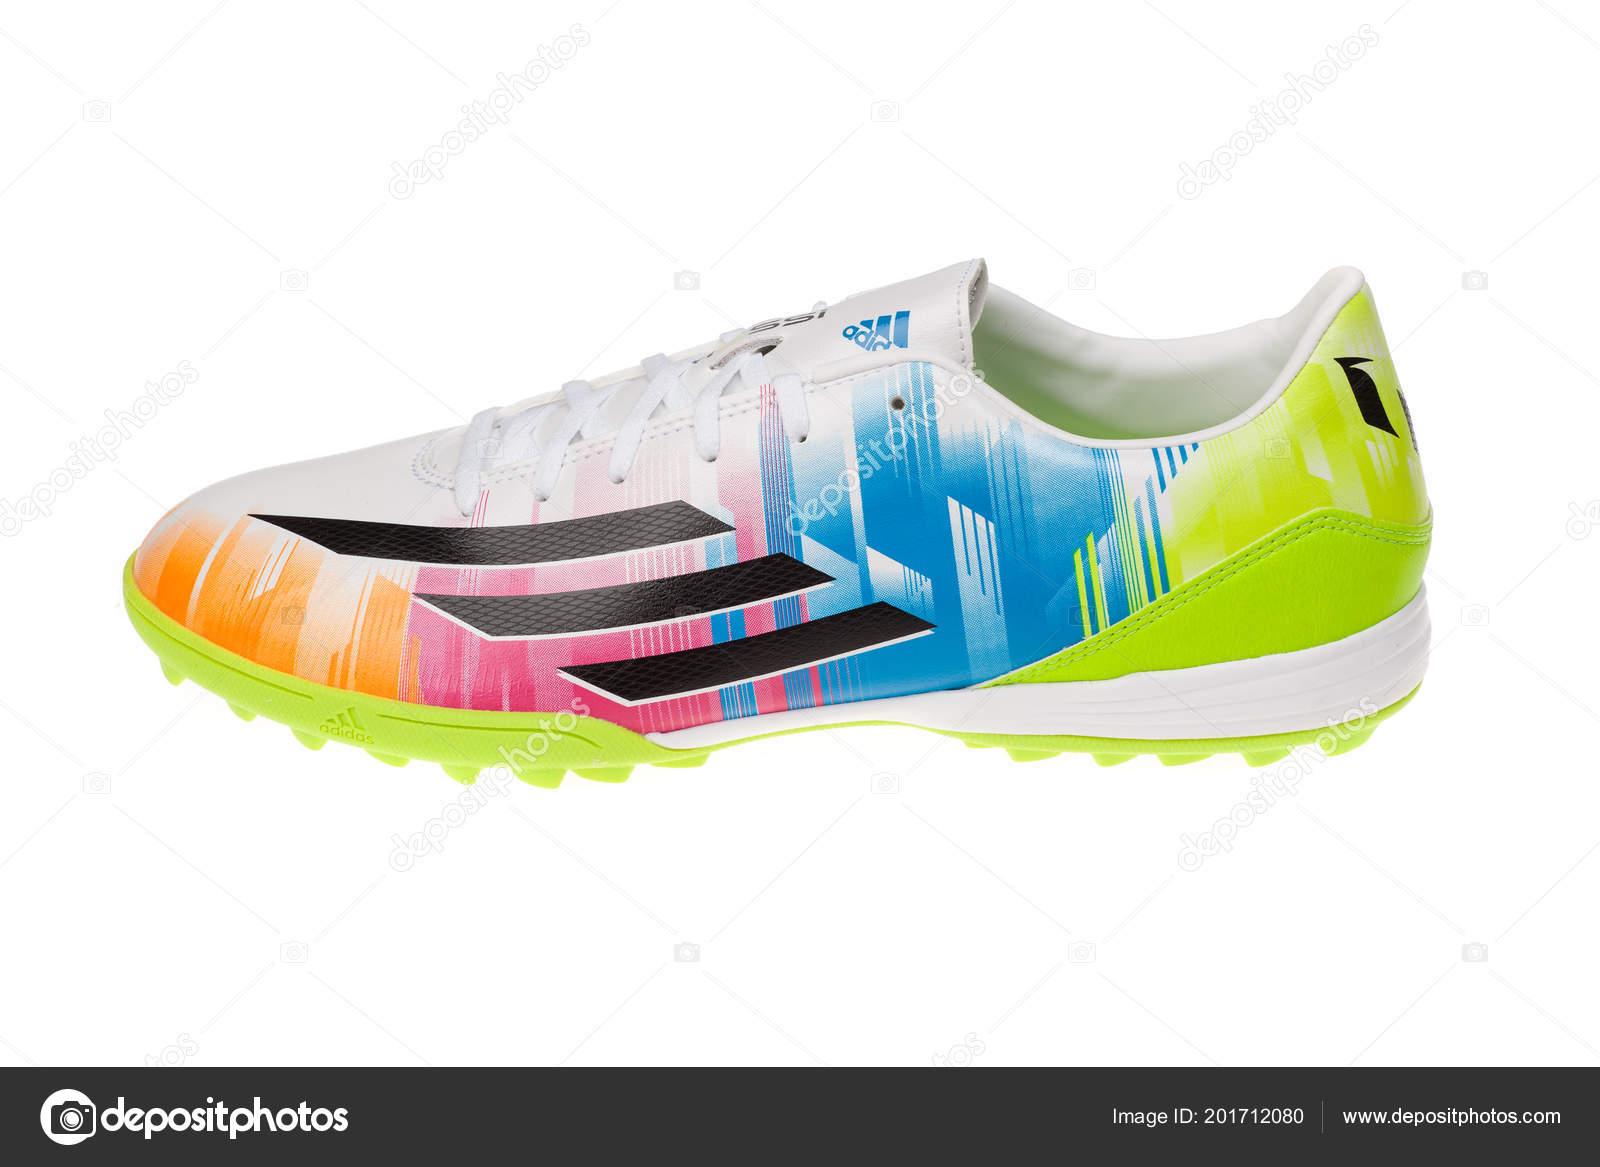 Varna Bulgaria July 2016 Adidas F10 Trx